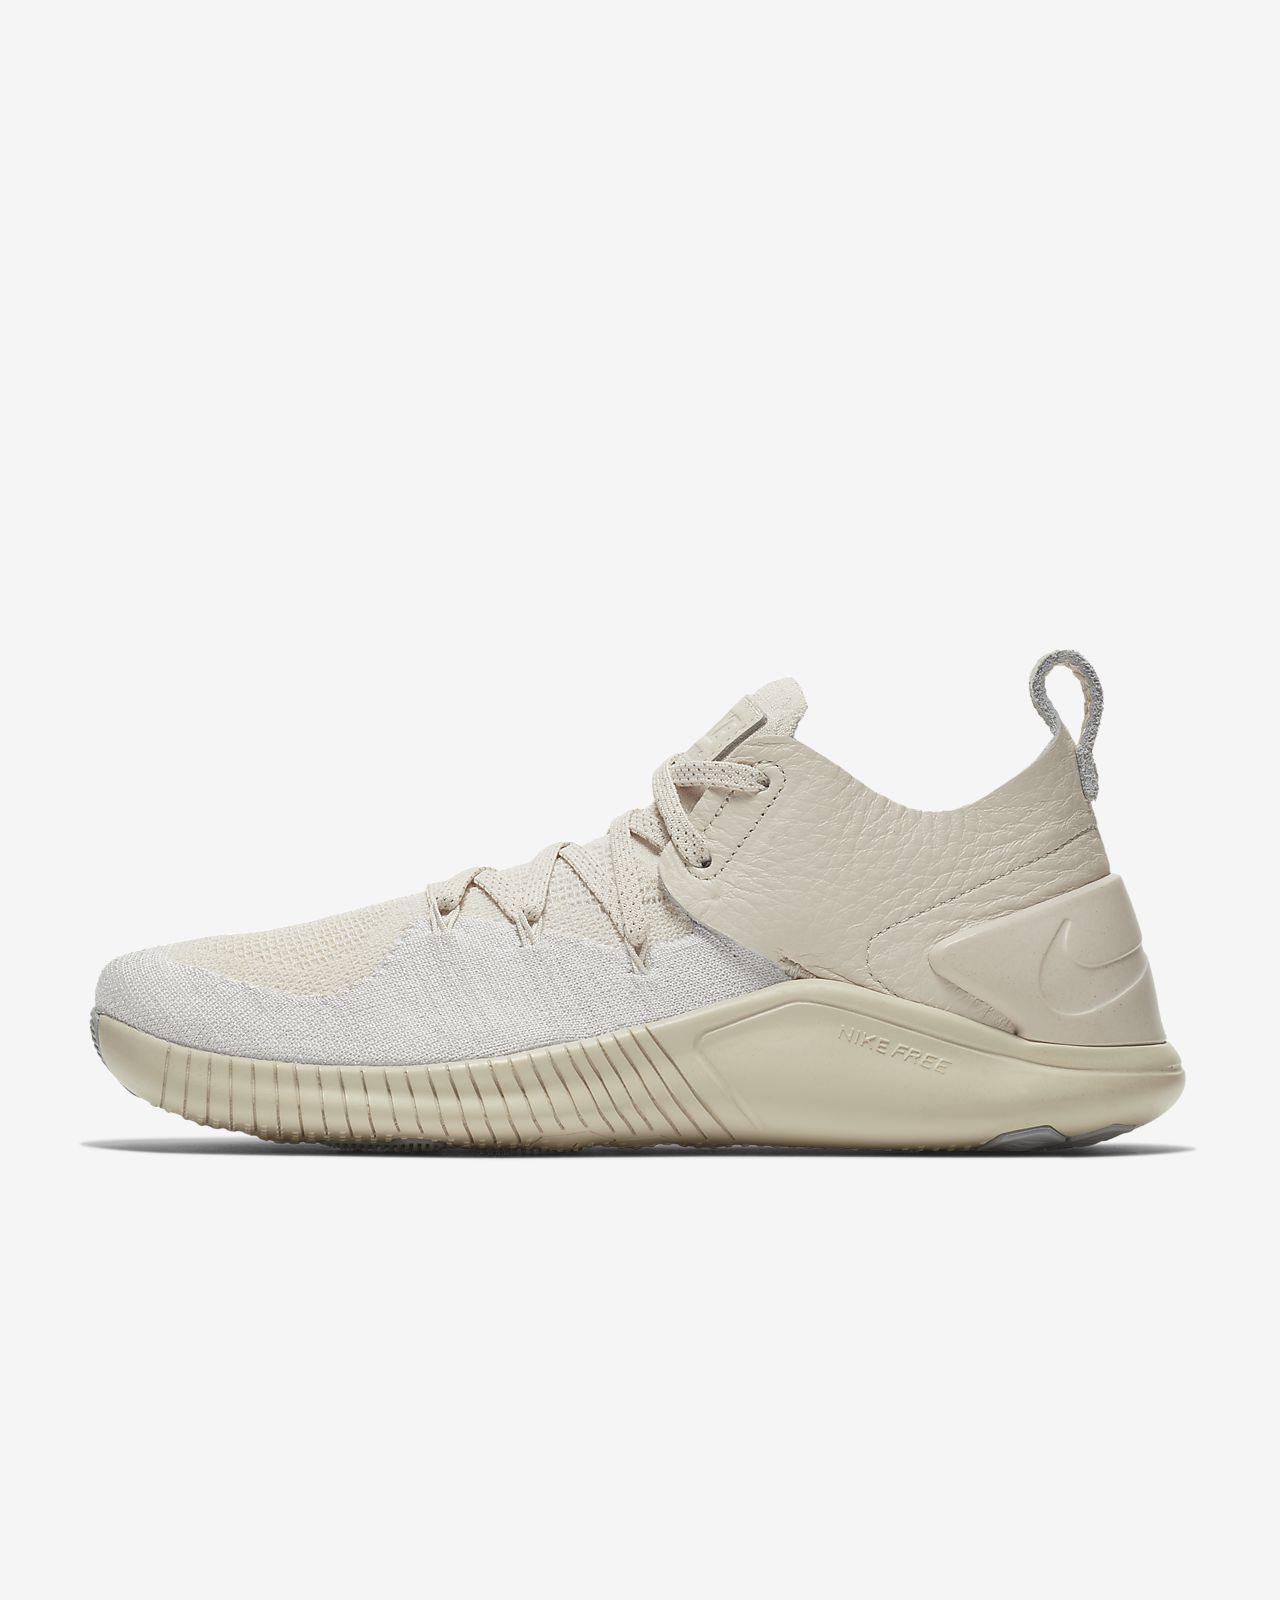 pretty nice 29d3f 8774a Women s Training Shoe. Nike Free TR Flyknit 3 Champagne